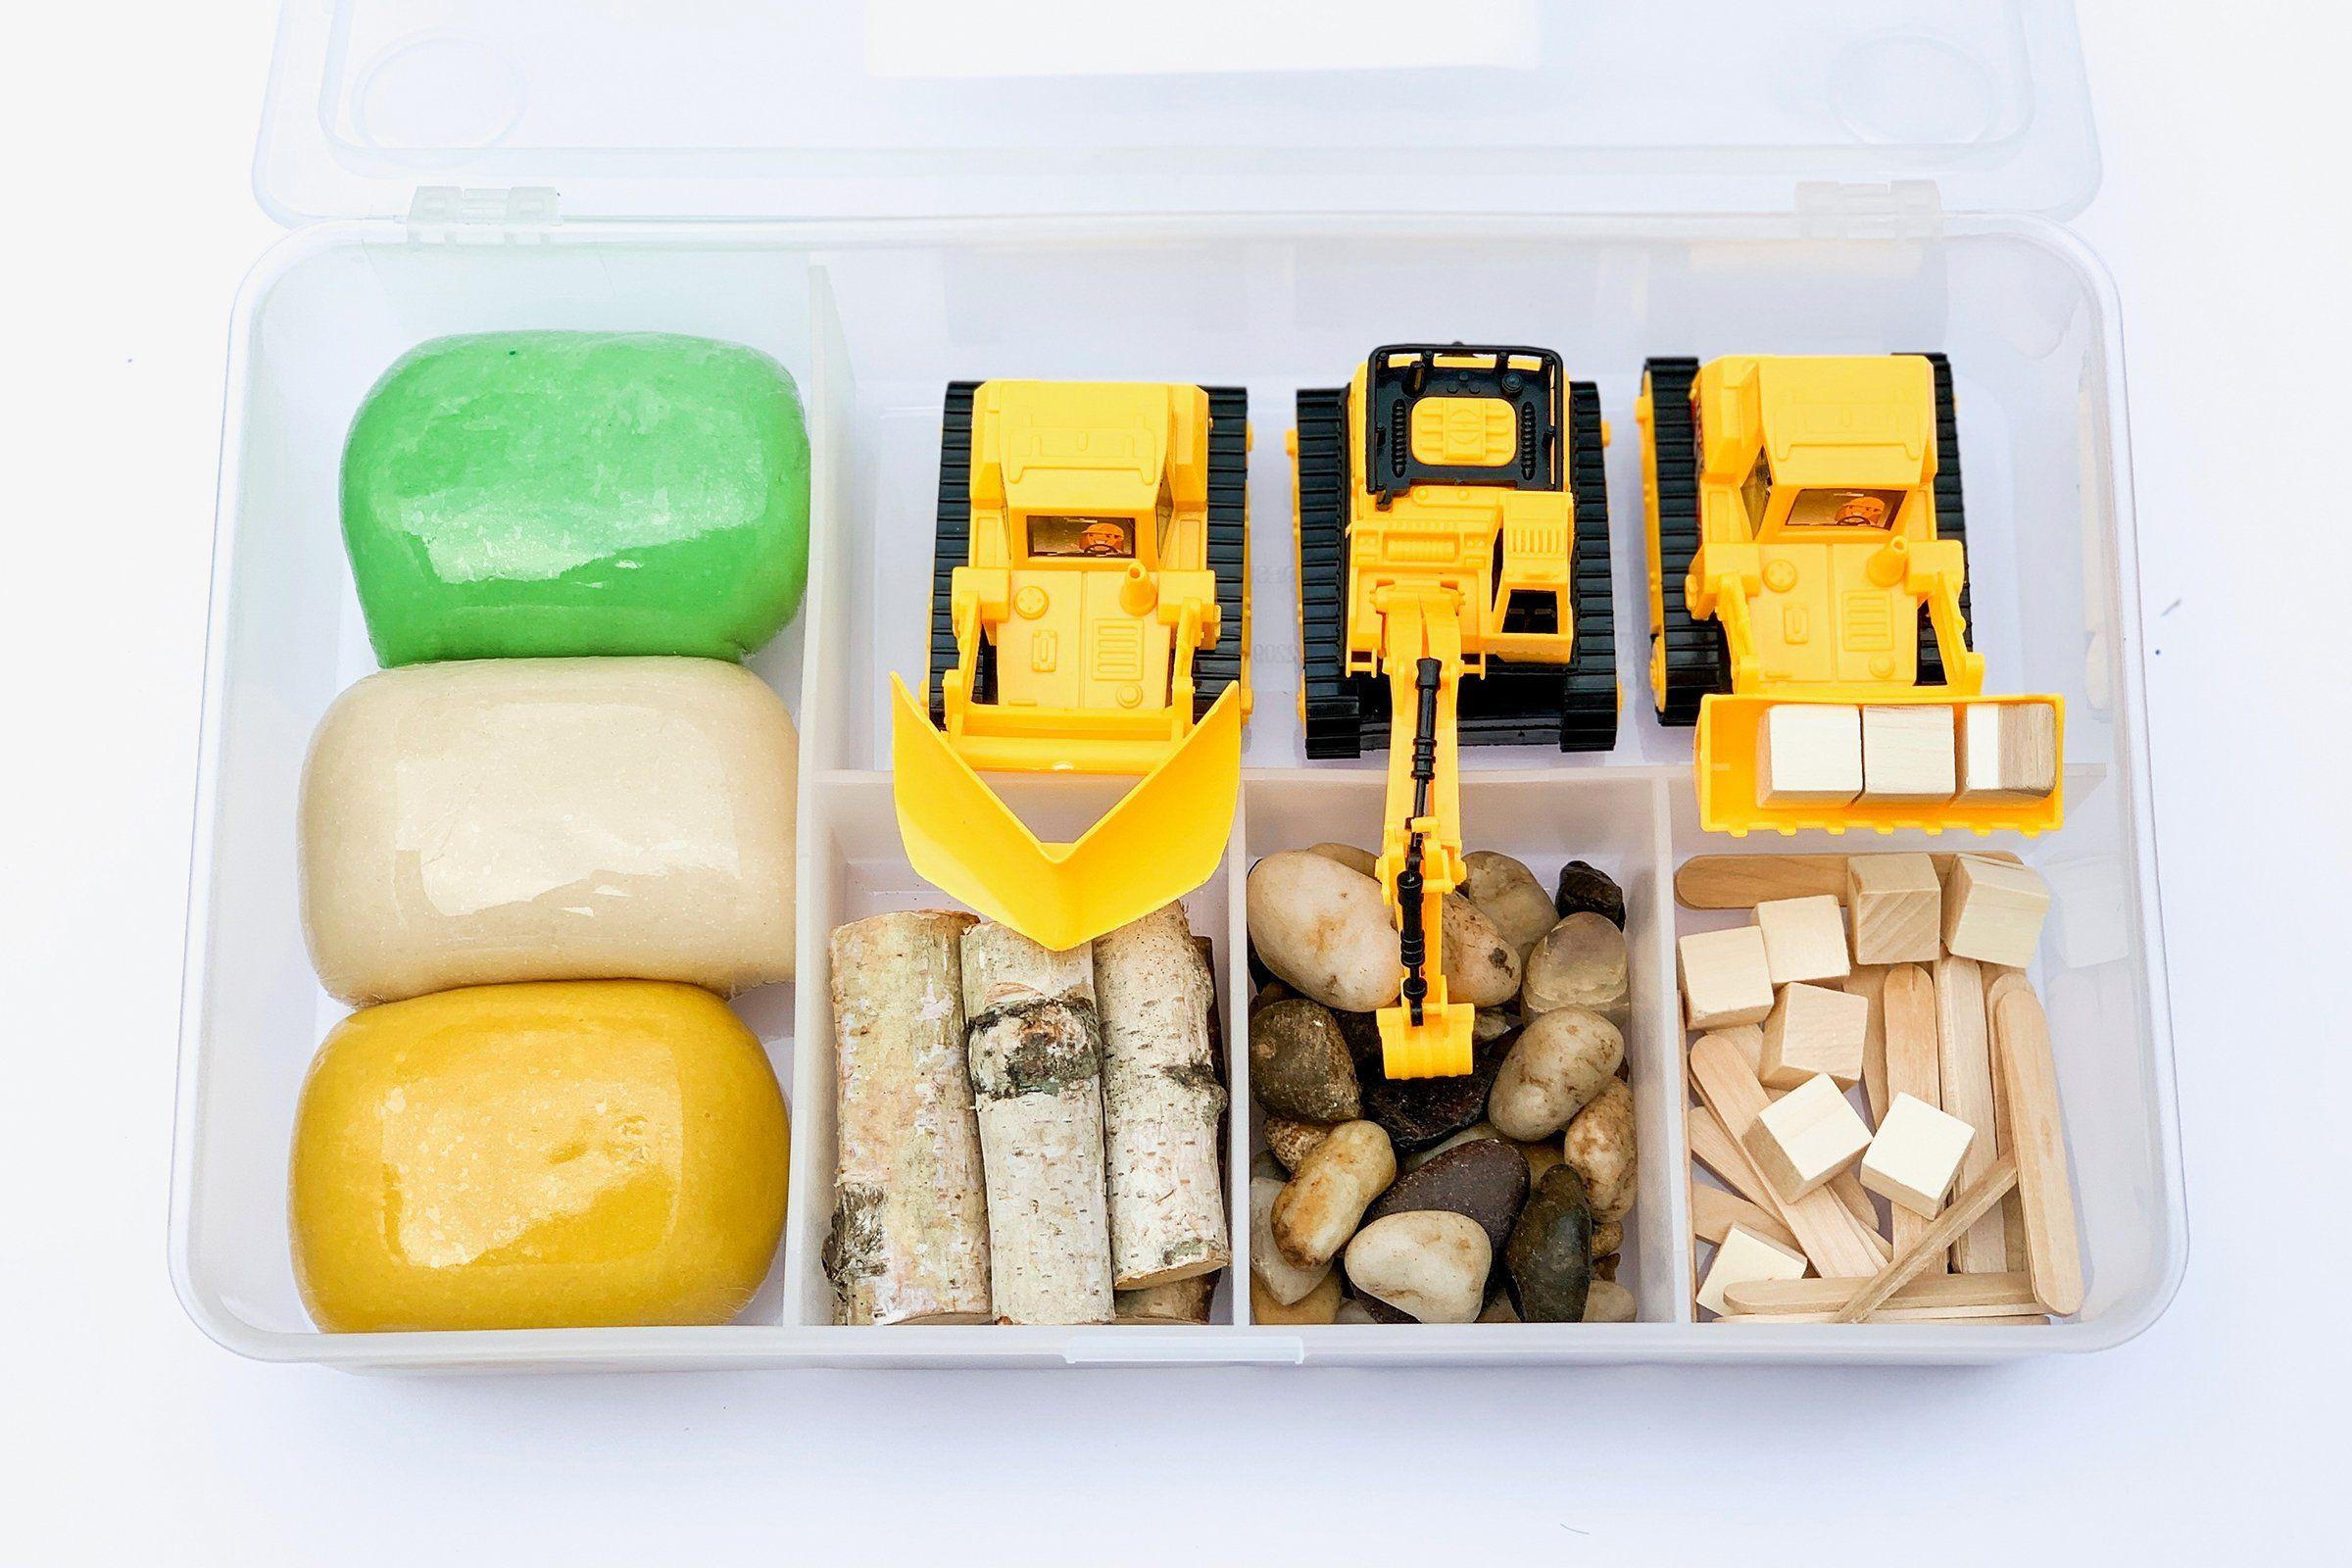 Construction Kit Playdough kits, Playdough kit gift